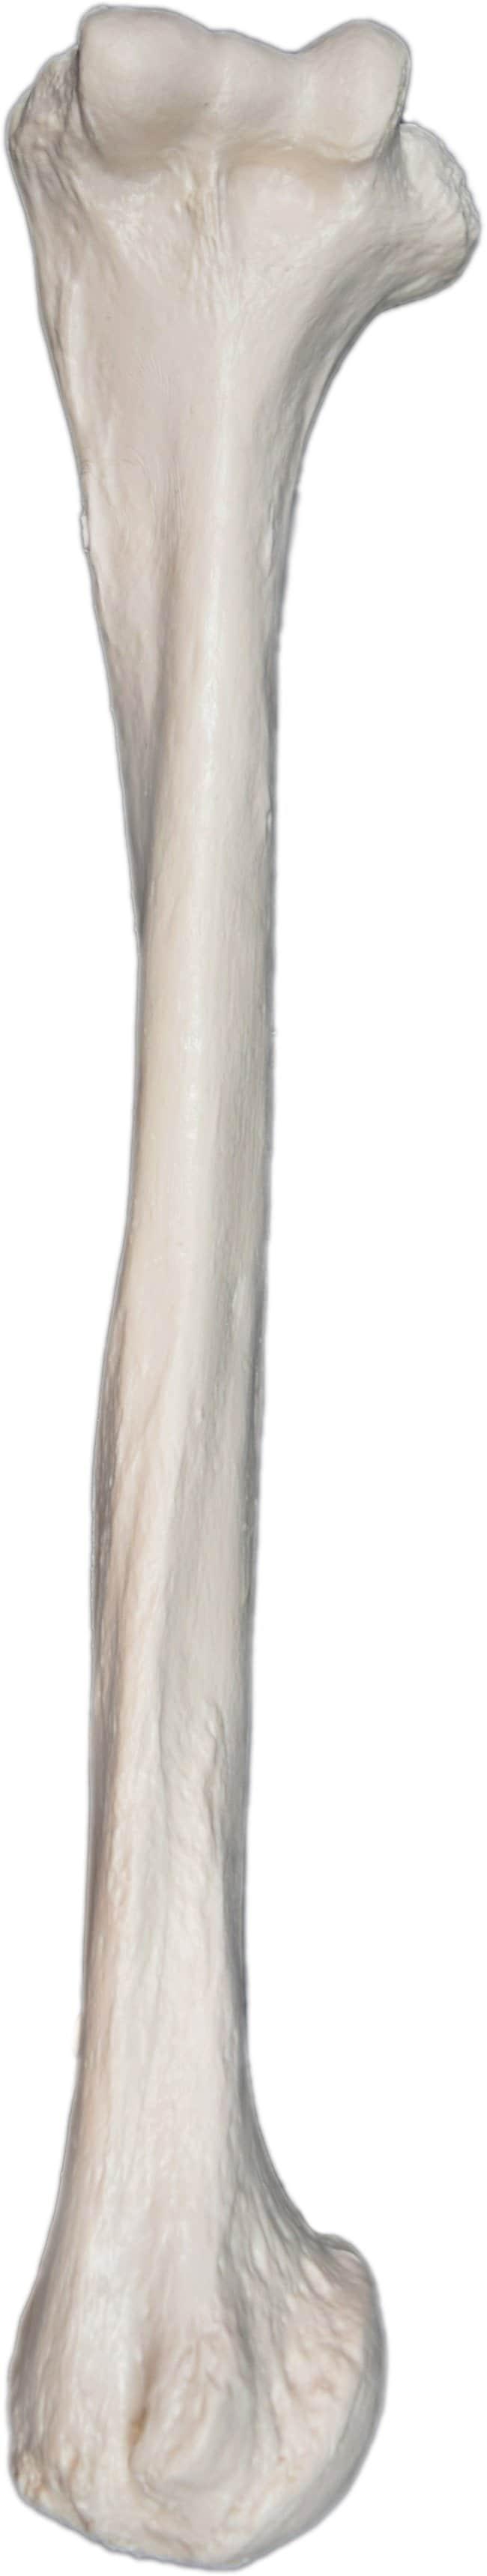 Eisco Human Humerus Bone Model  Left Side:Teaching Supplies